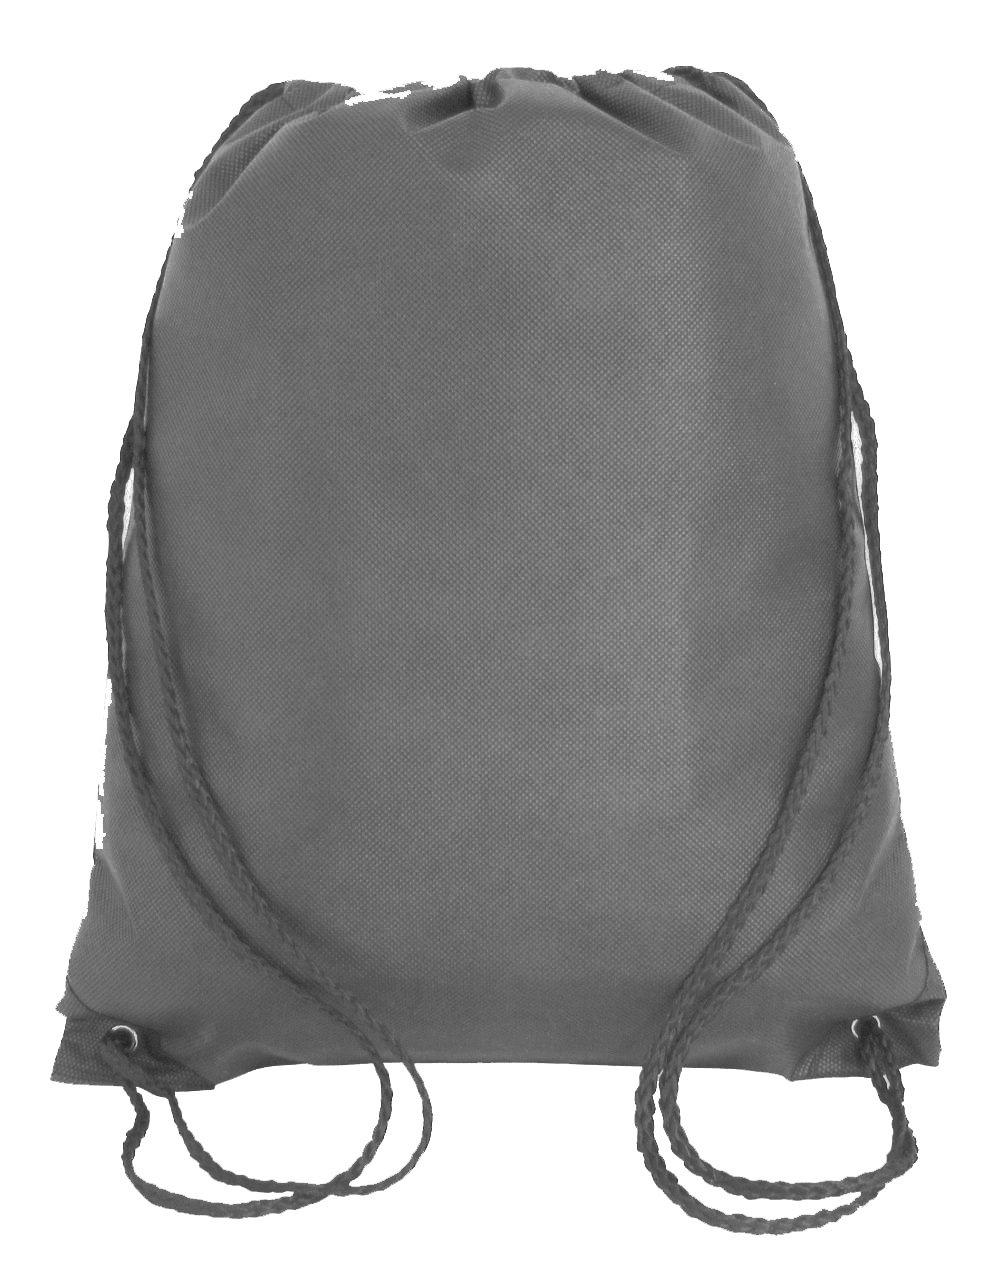 Bulk Drawstring Backpack Bags Sack Pack Cinch Tote Kids Sport Storage Bag for Gym Traveling (10, Black) TotebagFactory